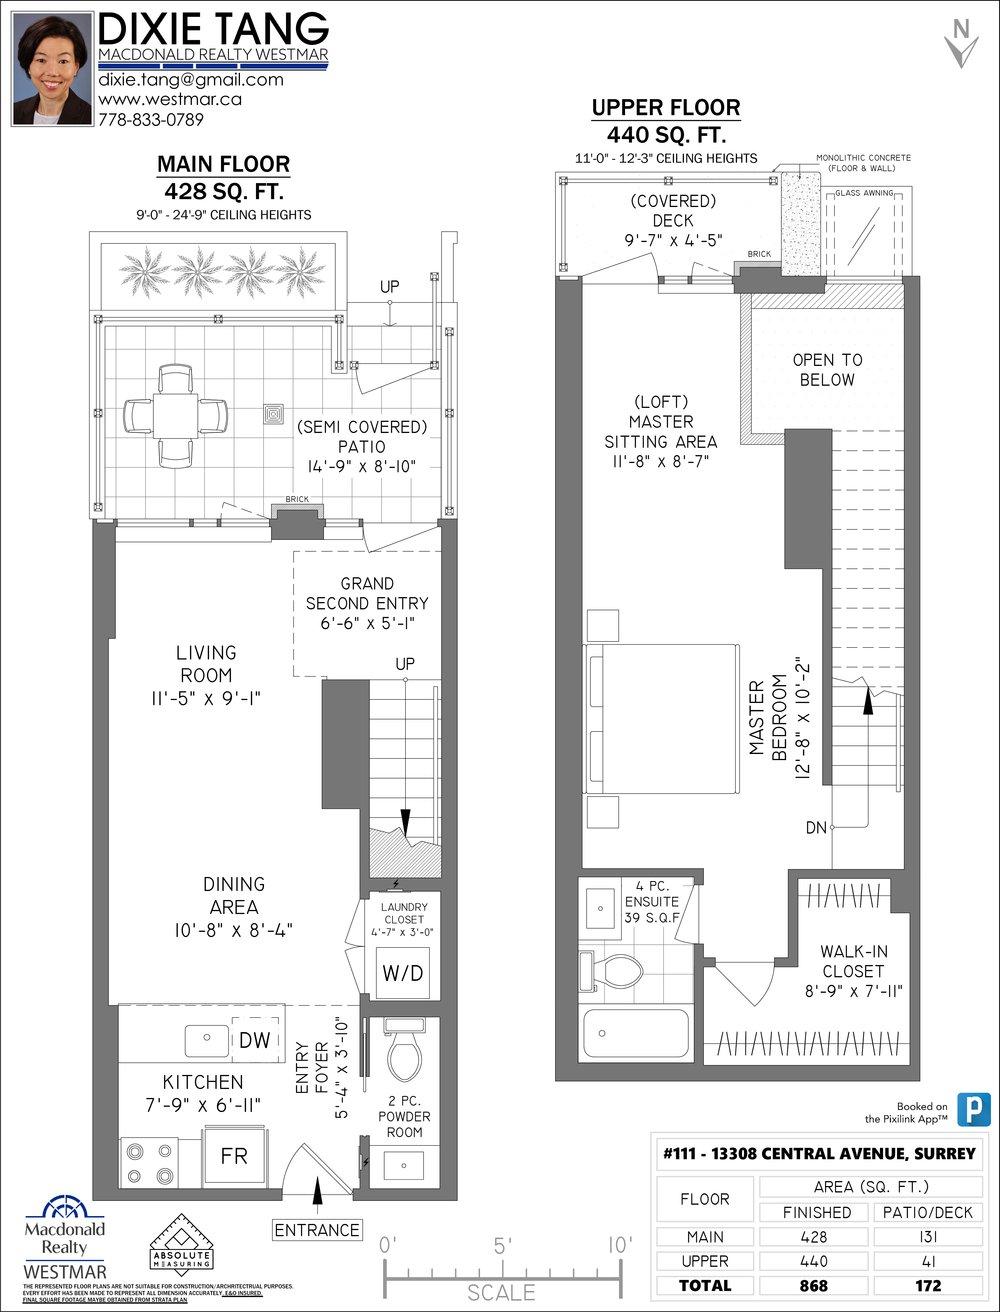 Floor Plan for a 1 Bedroom Townhouse in